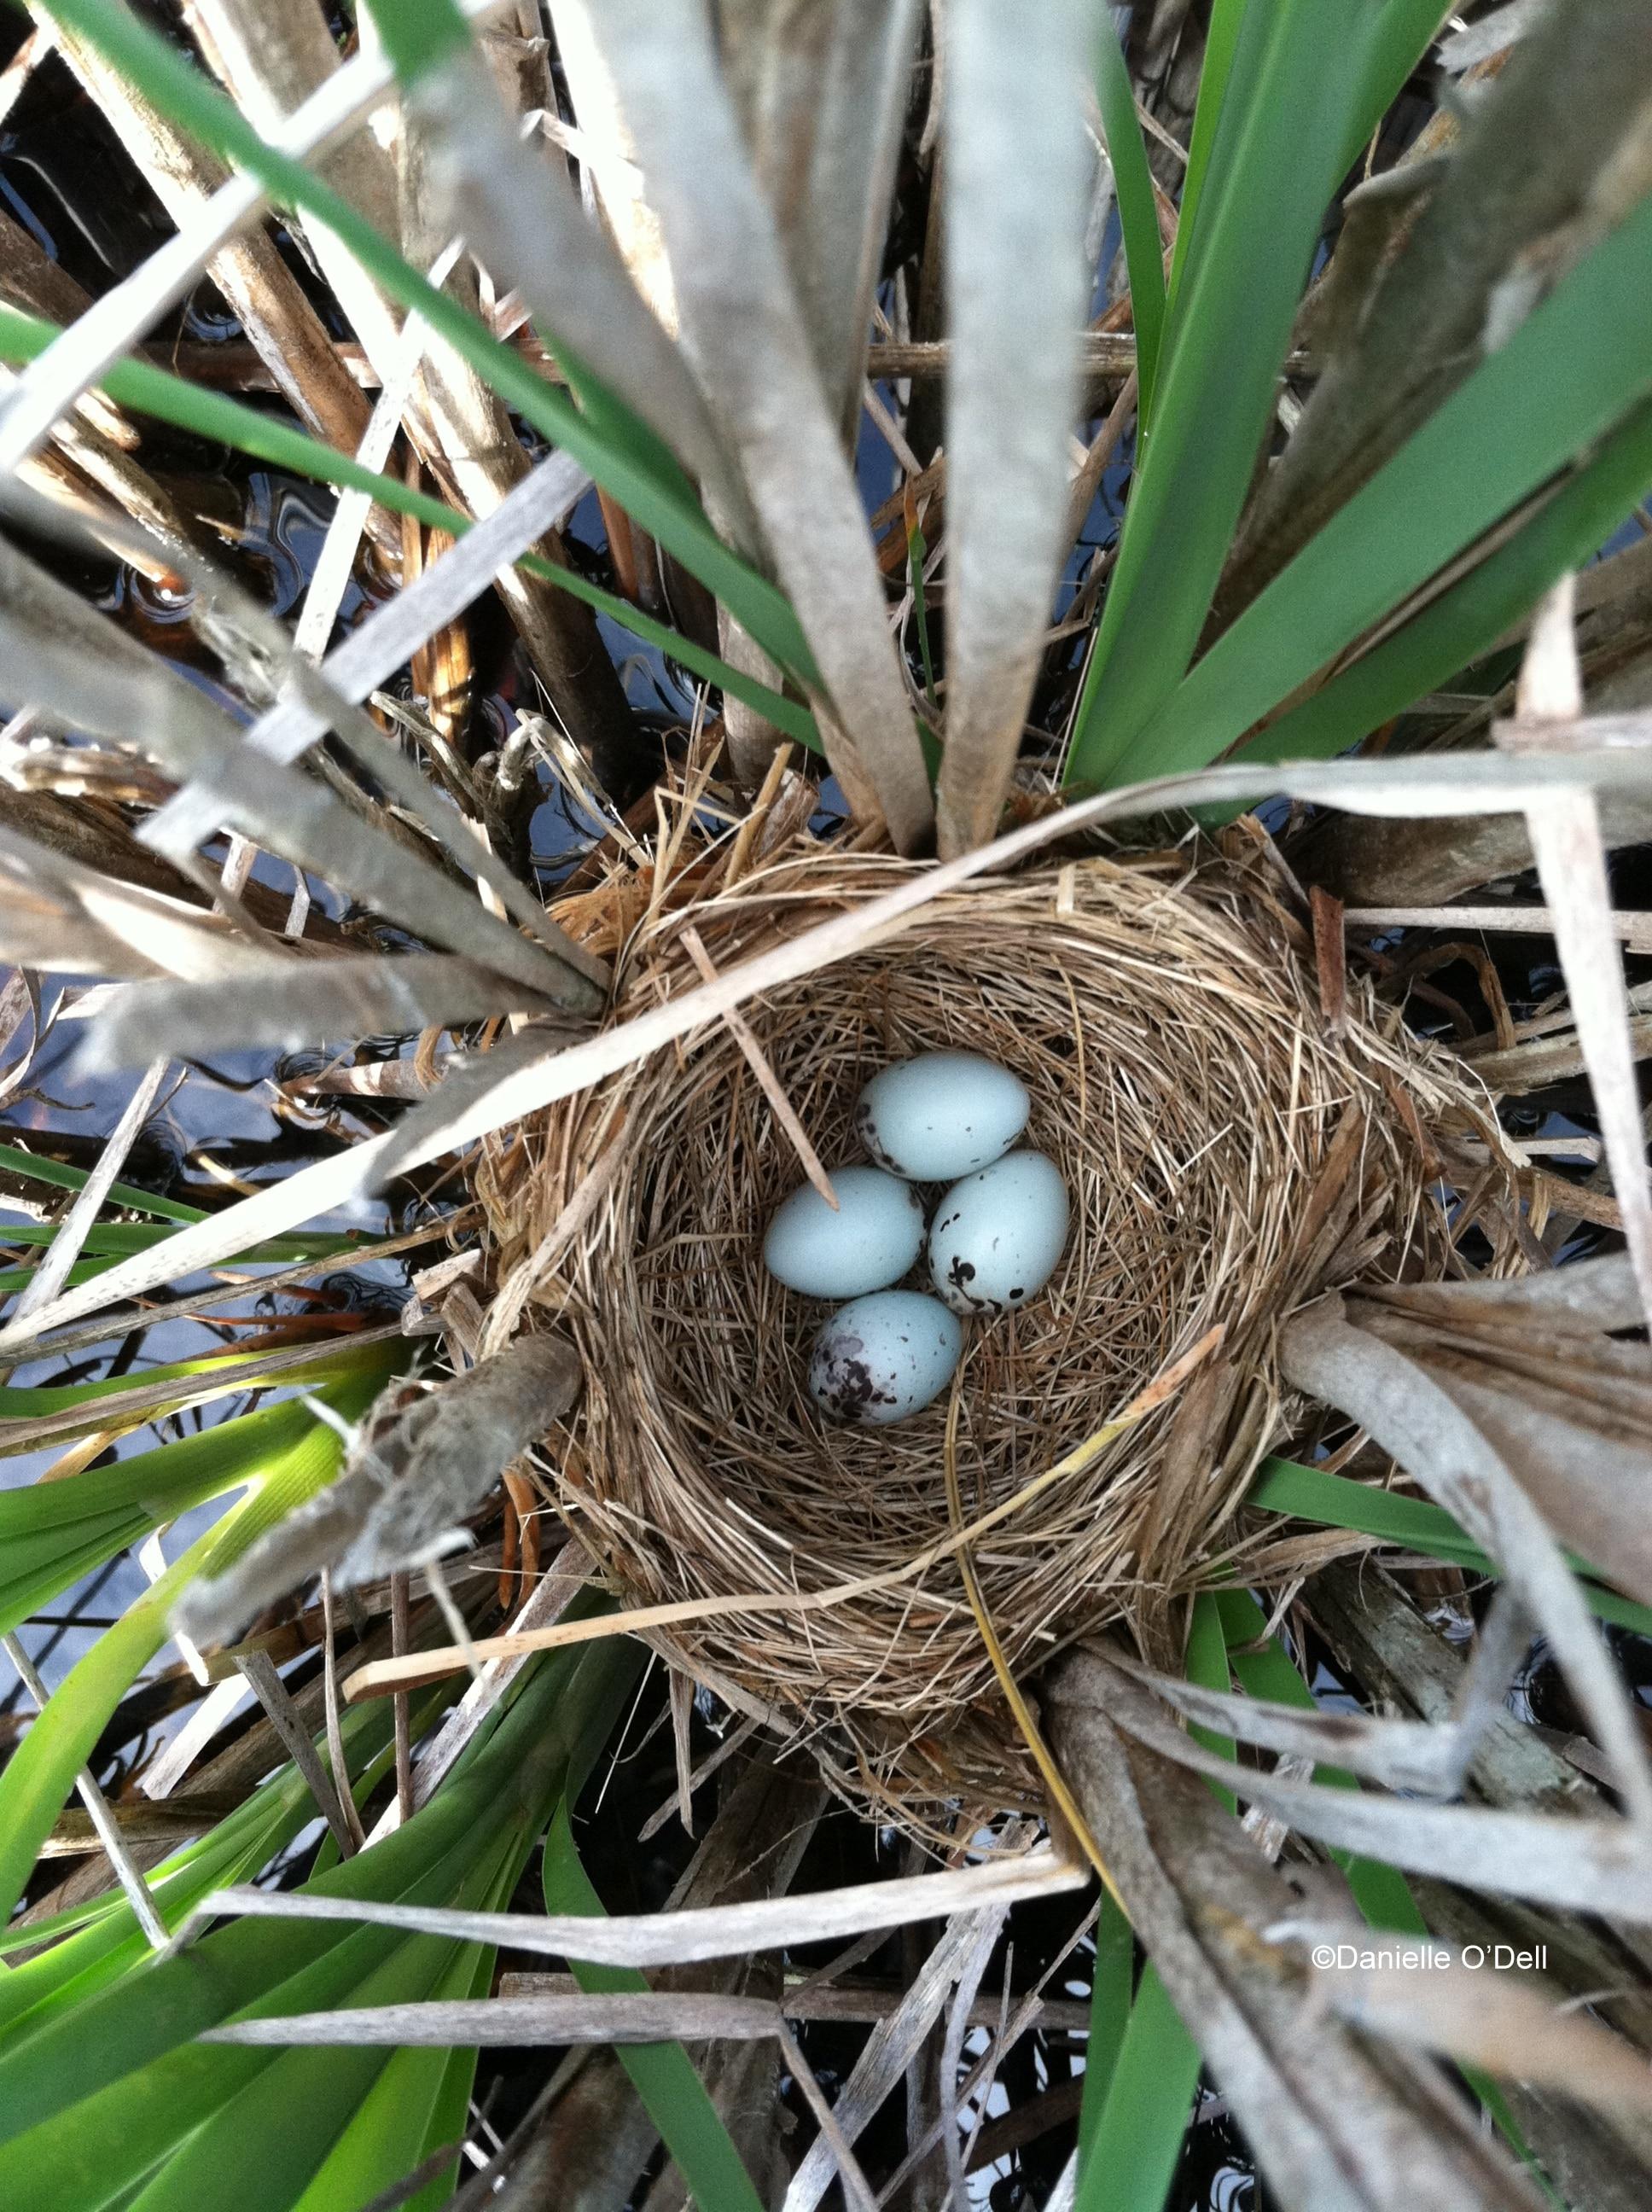 Red-winged blackbird nest in a cattail marsh